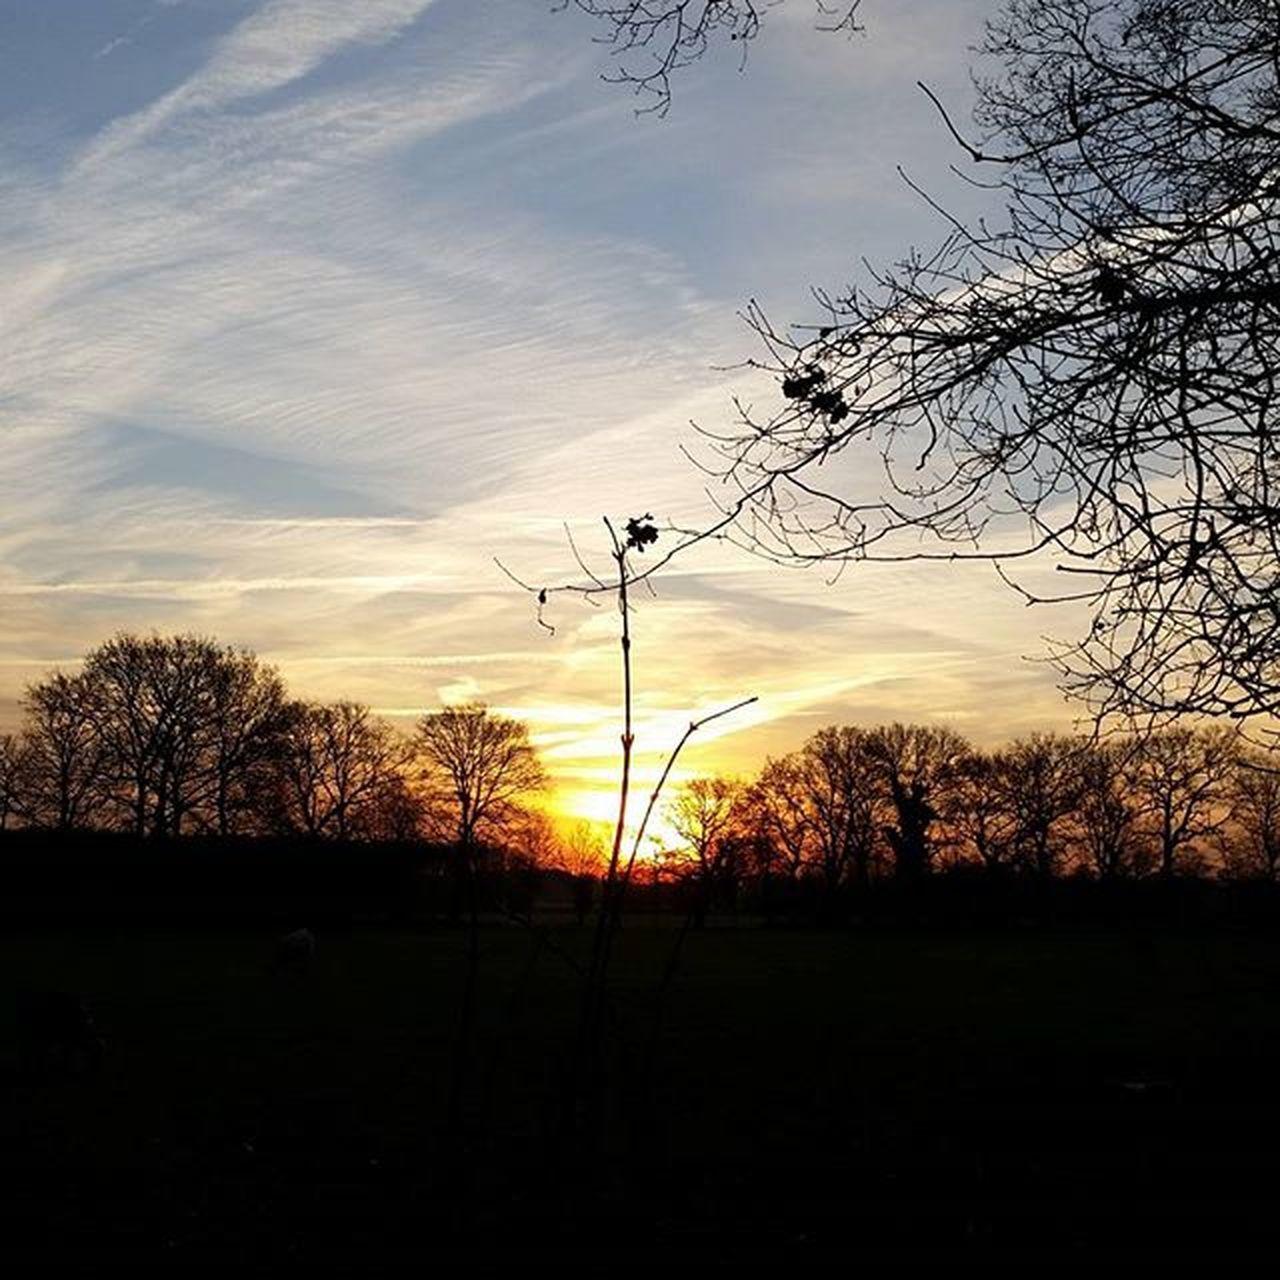 Sunrise Zonsopgang Iglimburg Hollandseluchten Natuurfotografie Ig_europe Sky_sultans Ic_trees Sky_captures